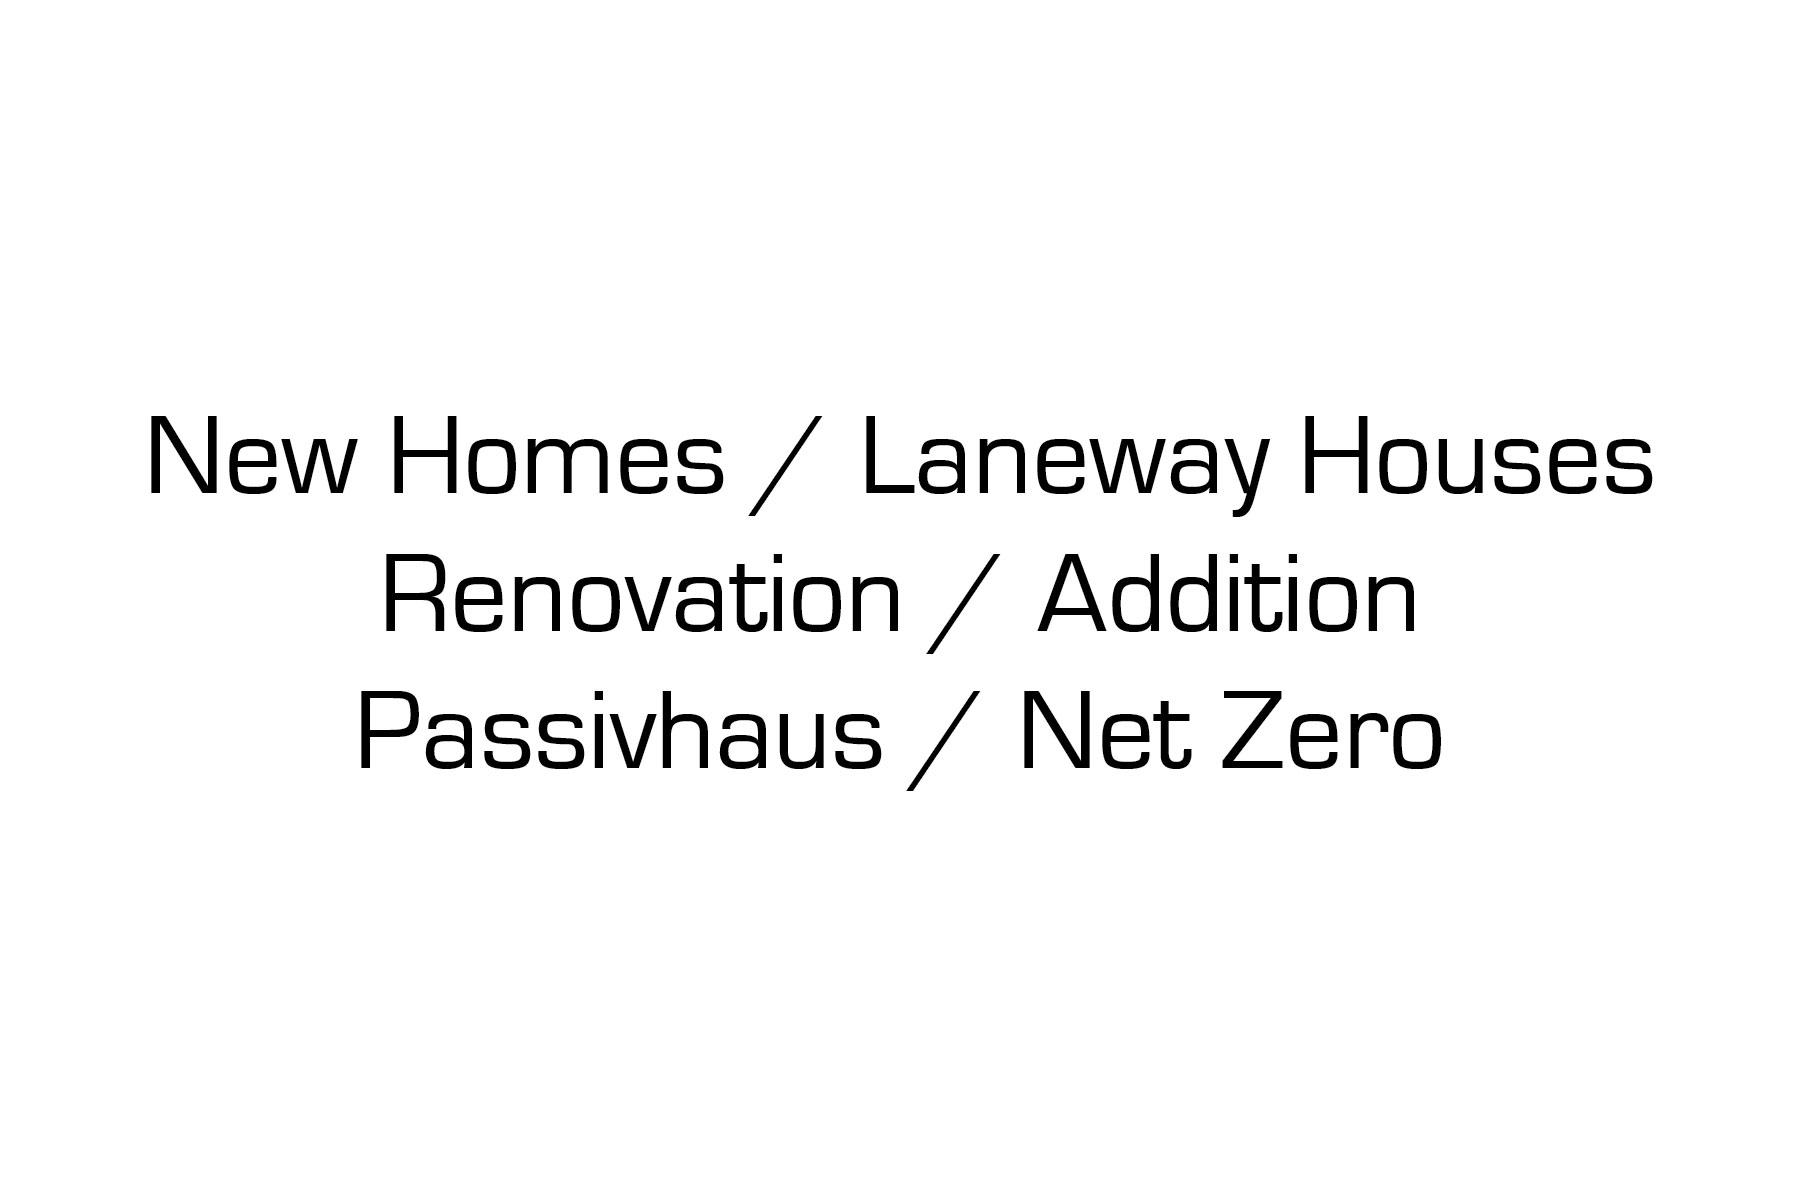 multigenerational family homes | laneway houses | passive house | energy efficient | west coast modern | mid-century | Intergenerational family home